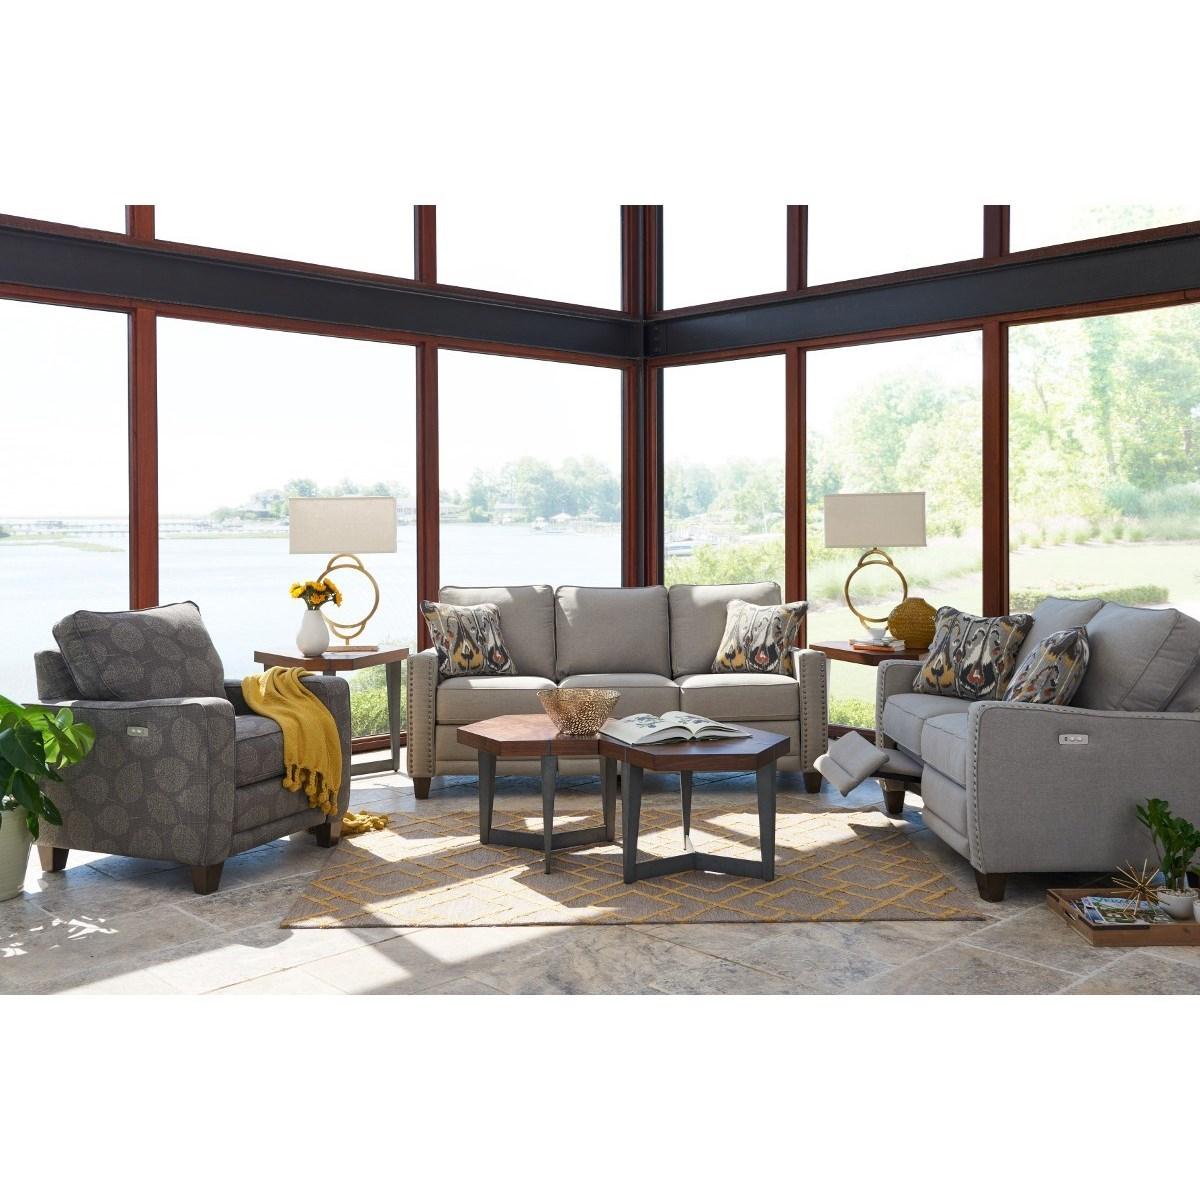 La Z Boy Makenna Reclining Living Room Group   Knight Furniture U0026 Mattress    Reclining Living Room Groups